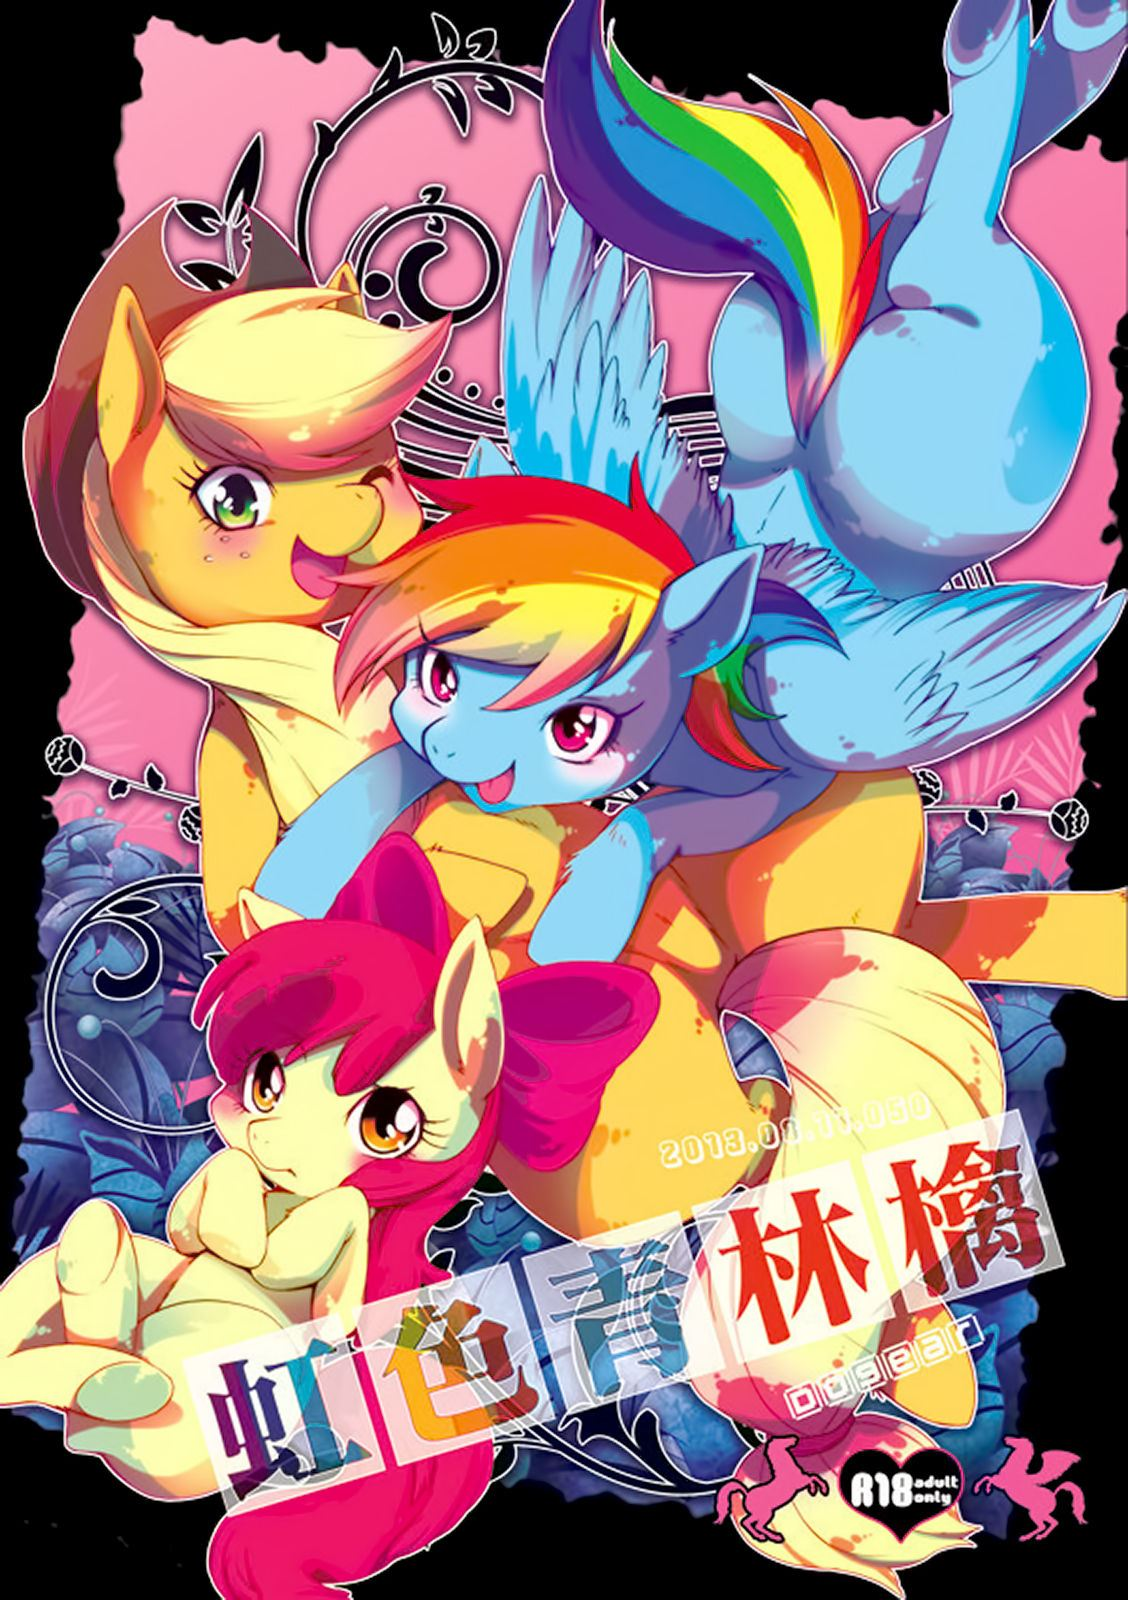 Niji Iro Ao Ringo | Rainbow Green Apple (My Little Pony: Friendship is Magic) [English]